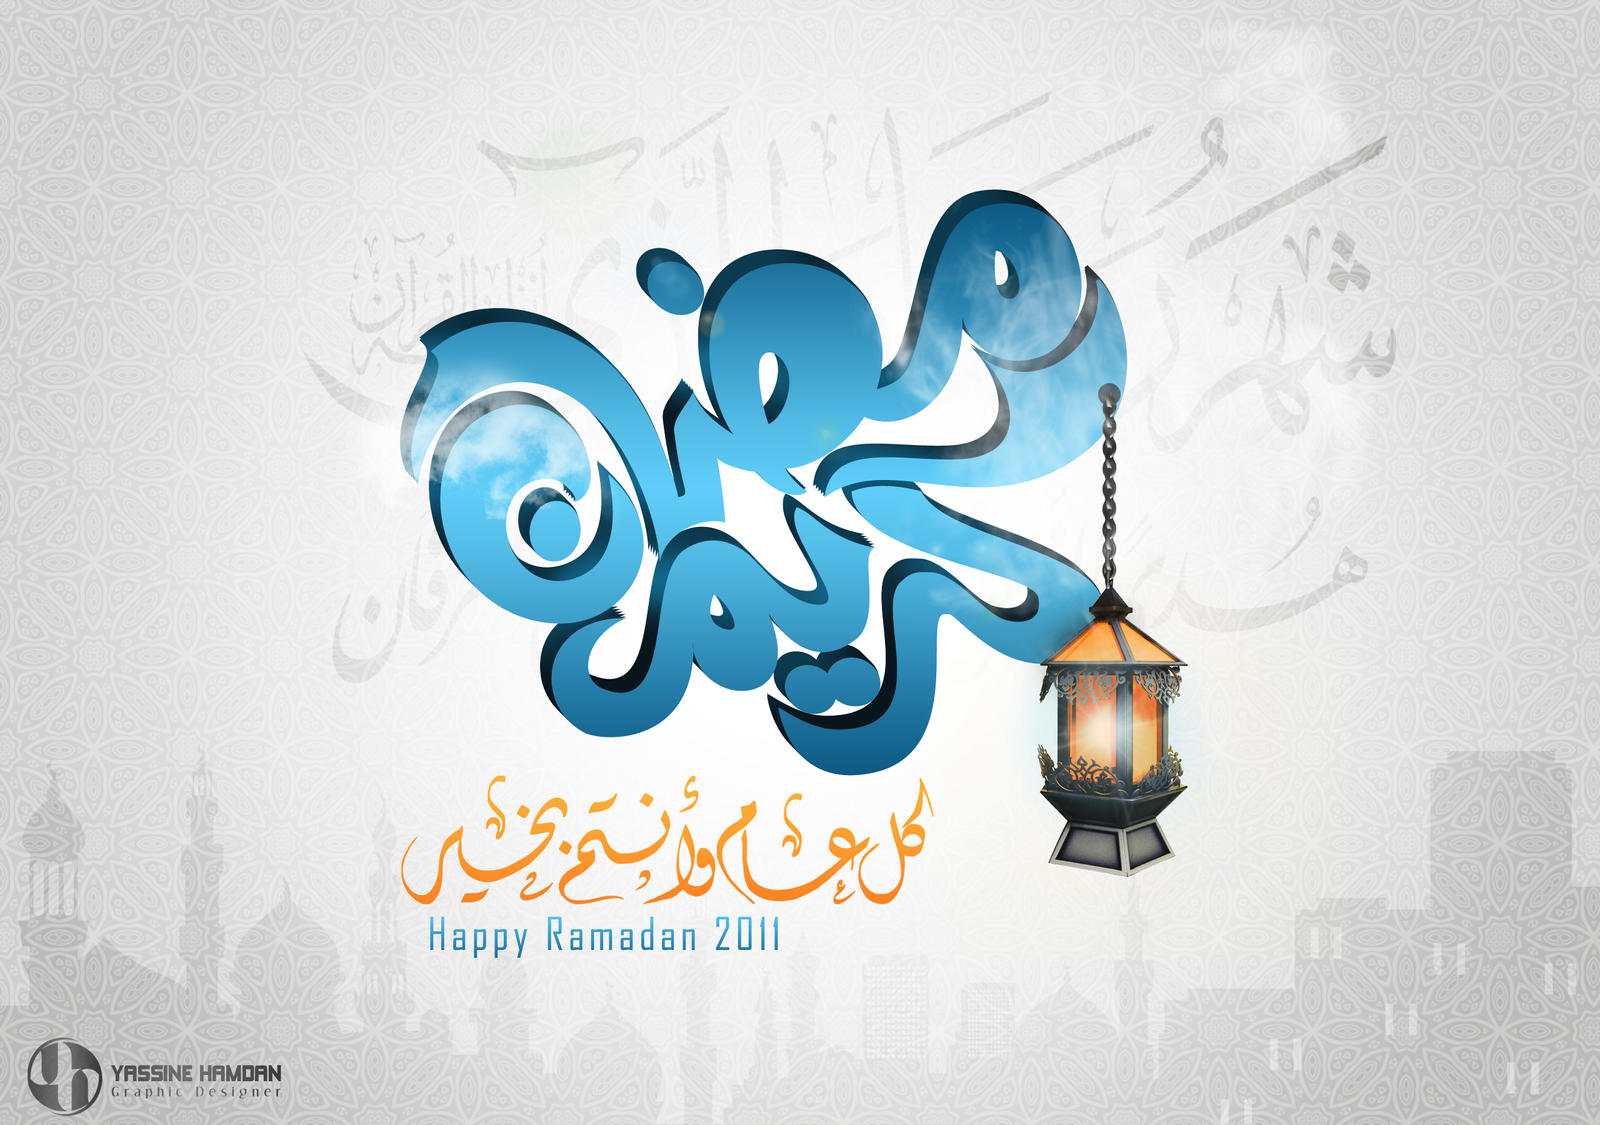 http://fc00.deviantart.net/fs71/i/2011/213/8/6/happy_ramadan_2011_by_hamdan_graphics-d42dhi6.jpg